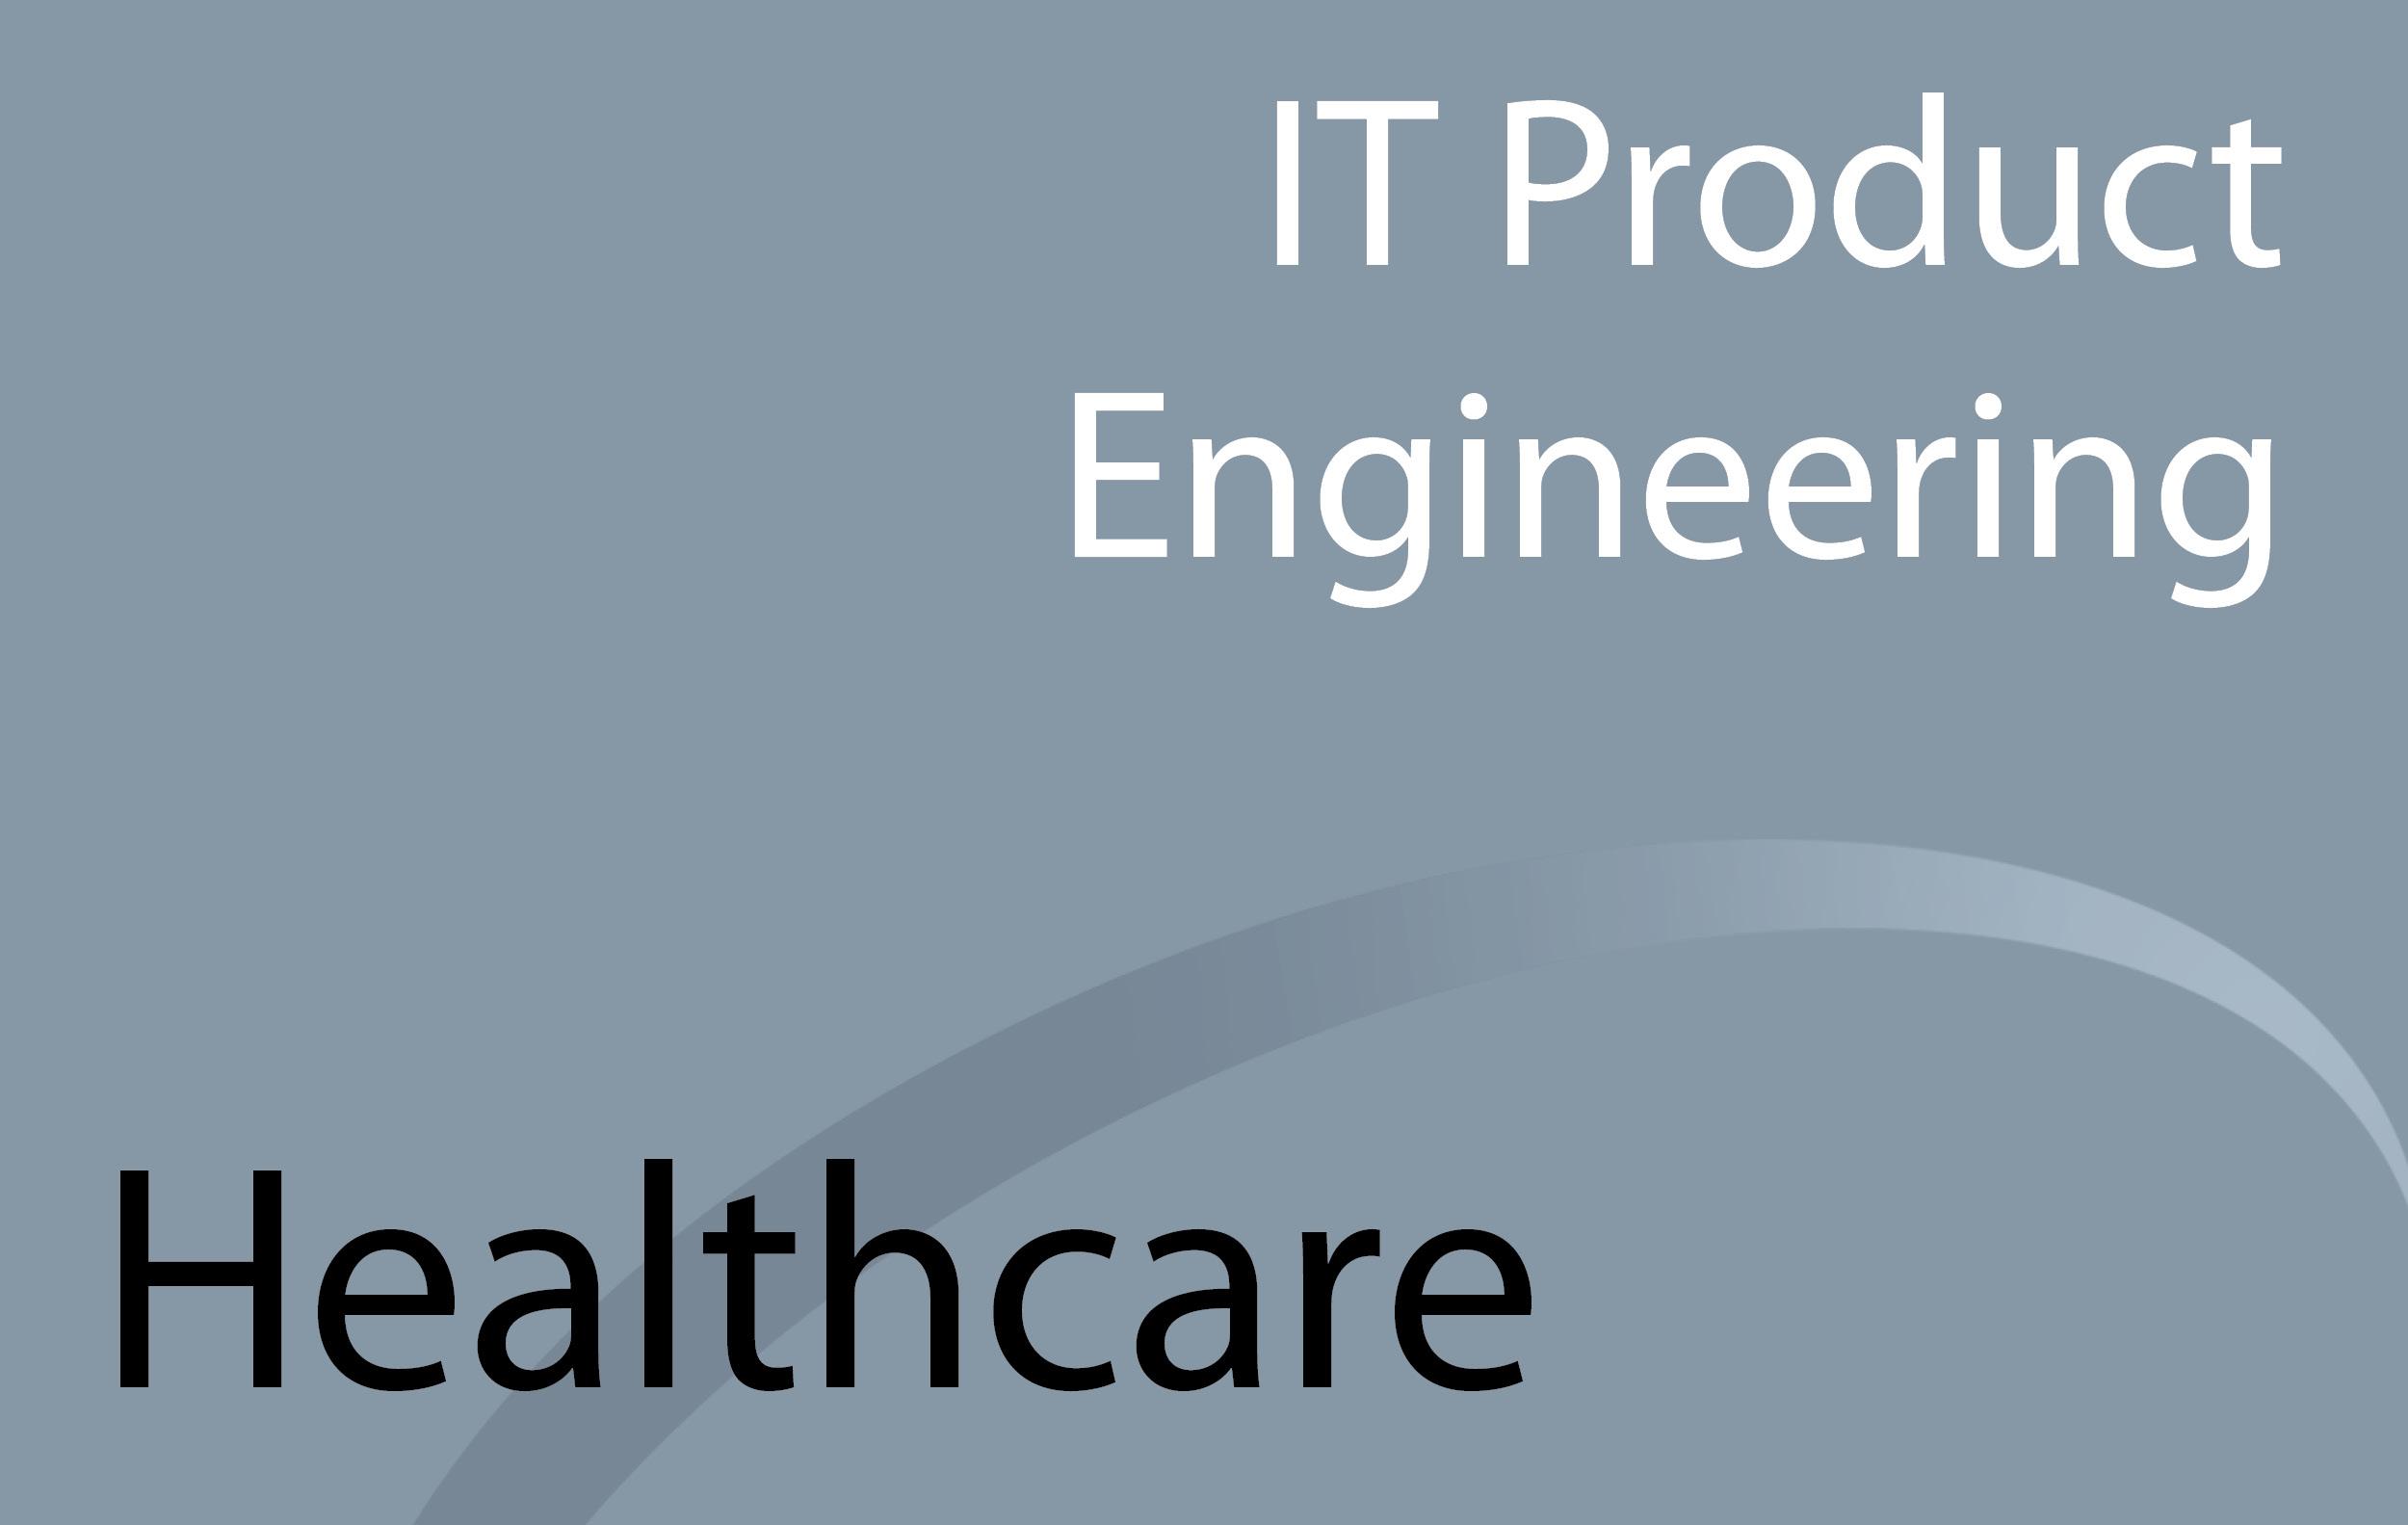 TVP-HealthCare